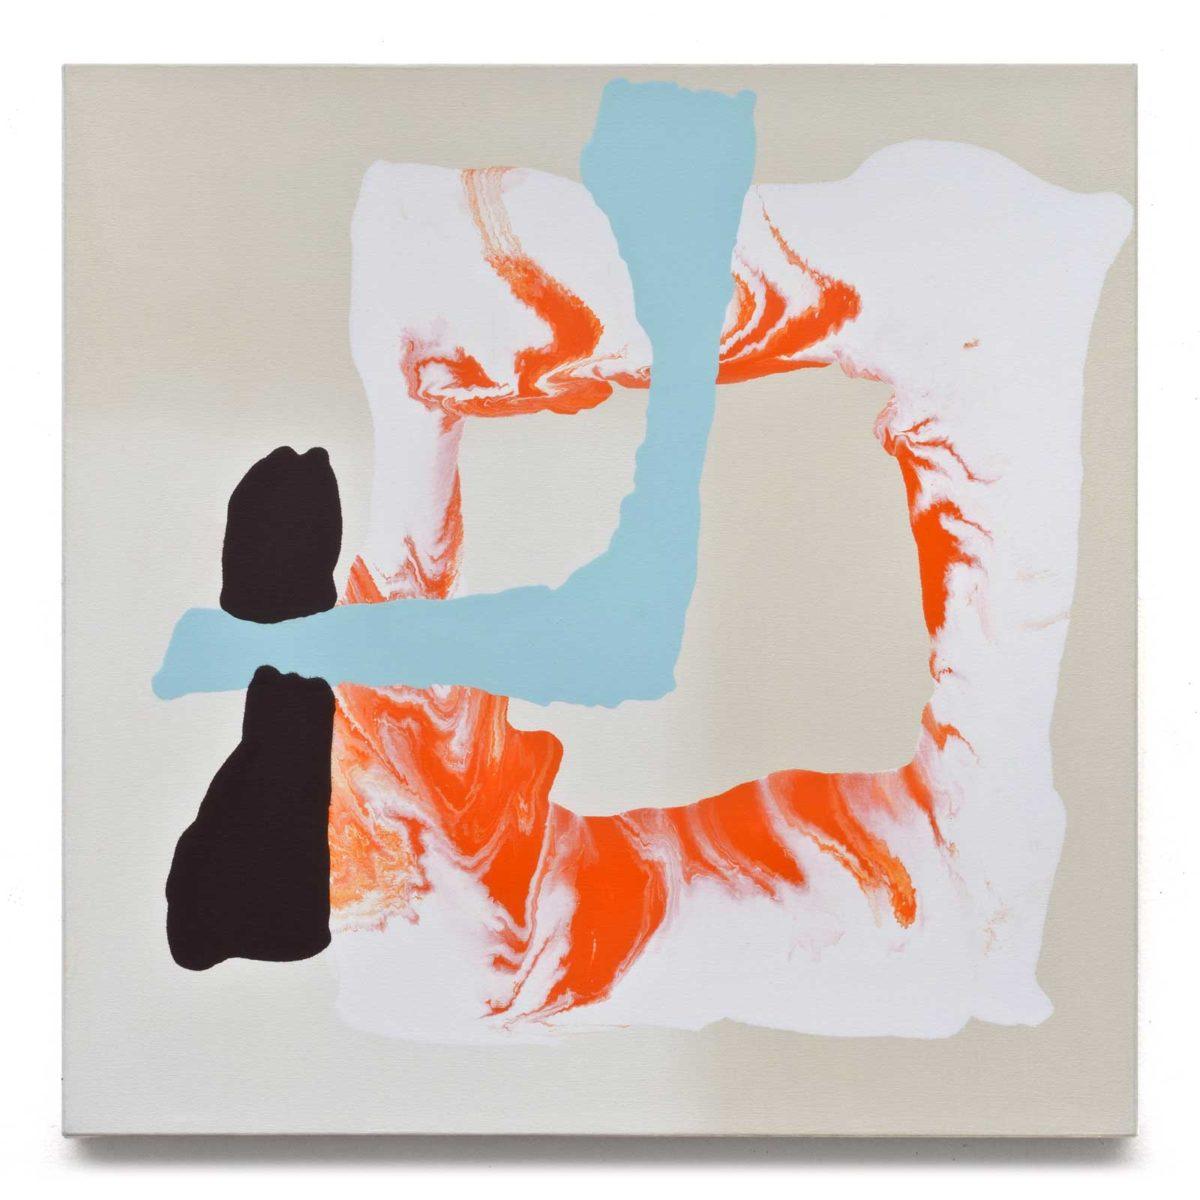 Ephemera-1-oil-on-canvas-60.96 cm x 60.96 cm.